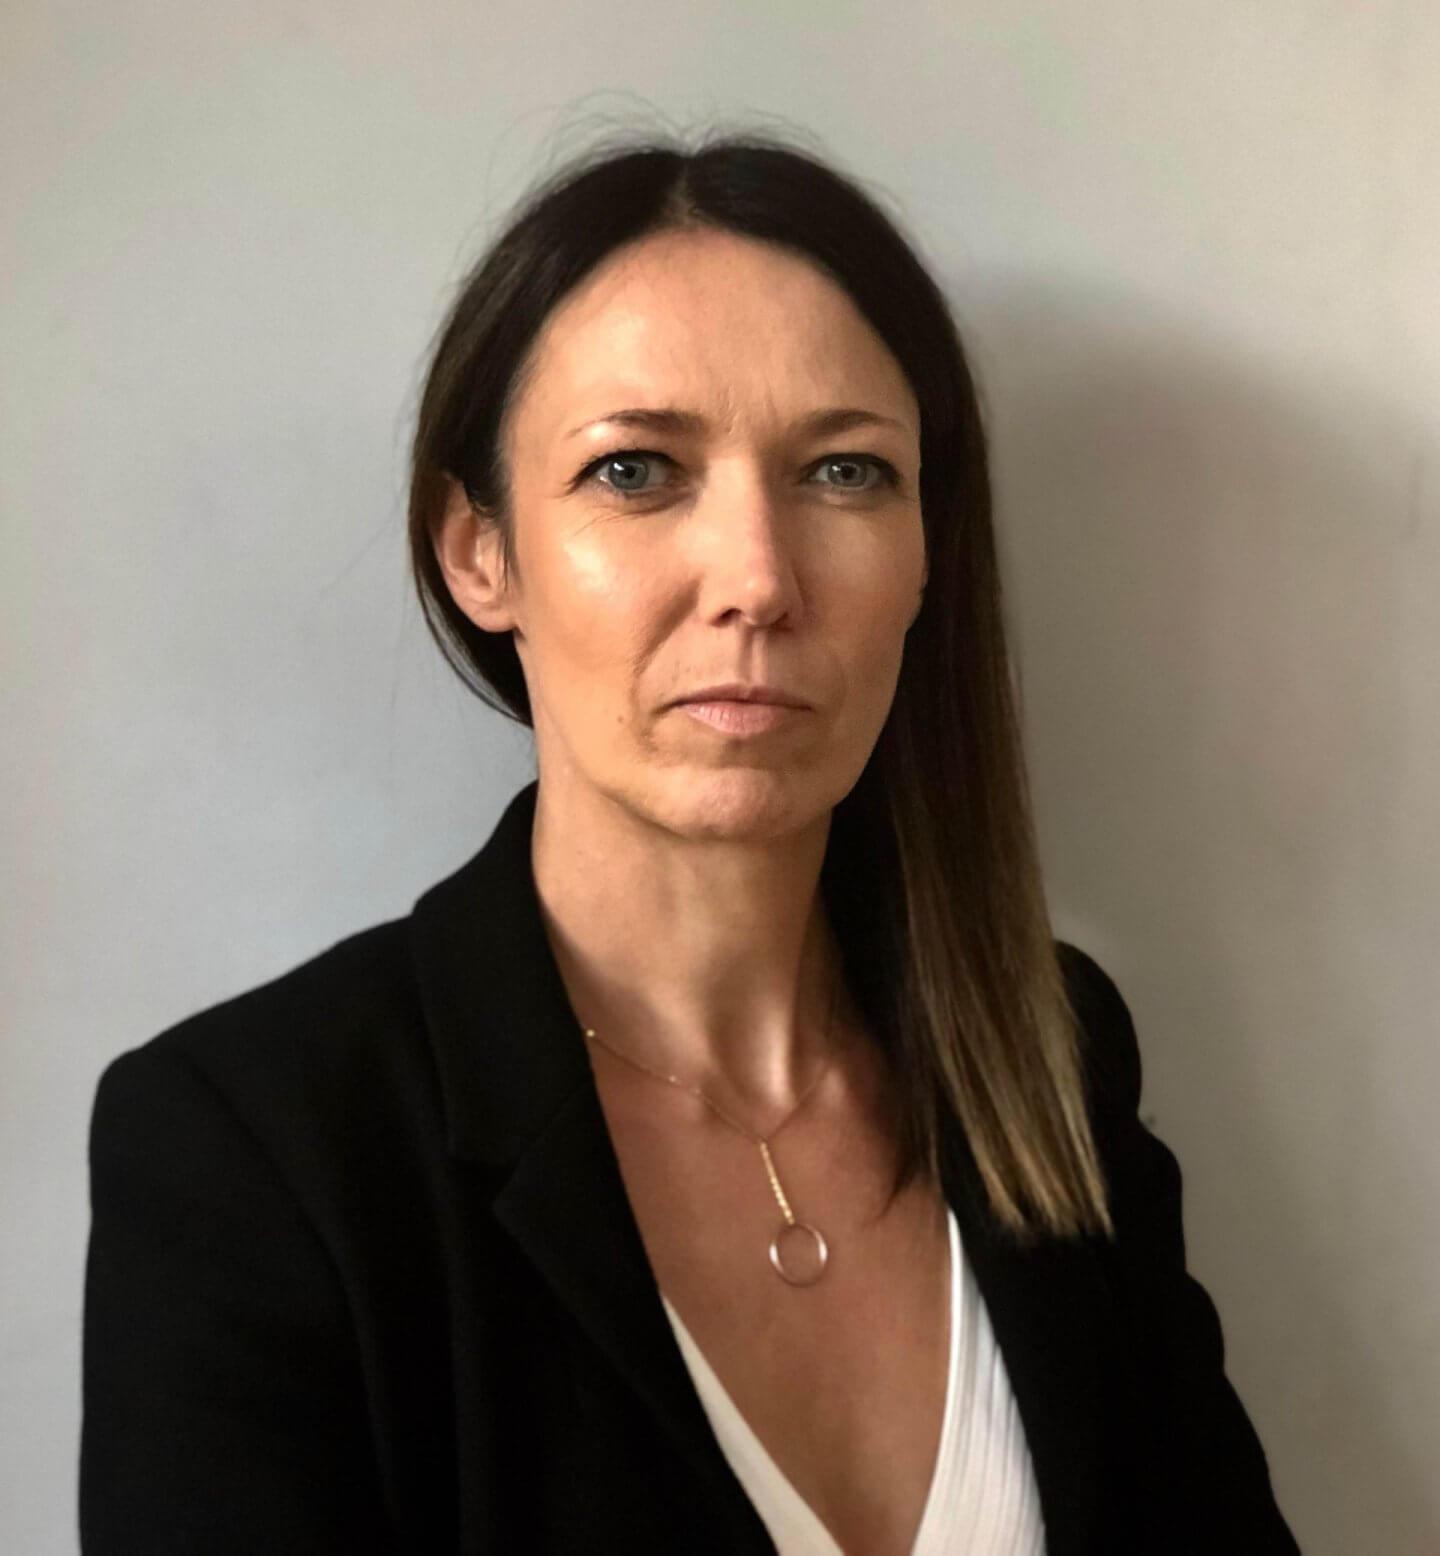 Grainne Fahy Head of Family Law at BLM